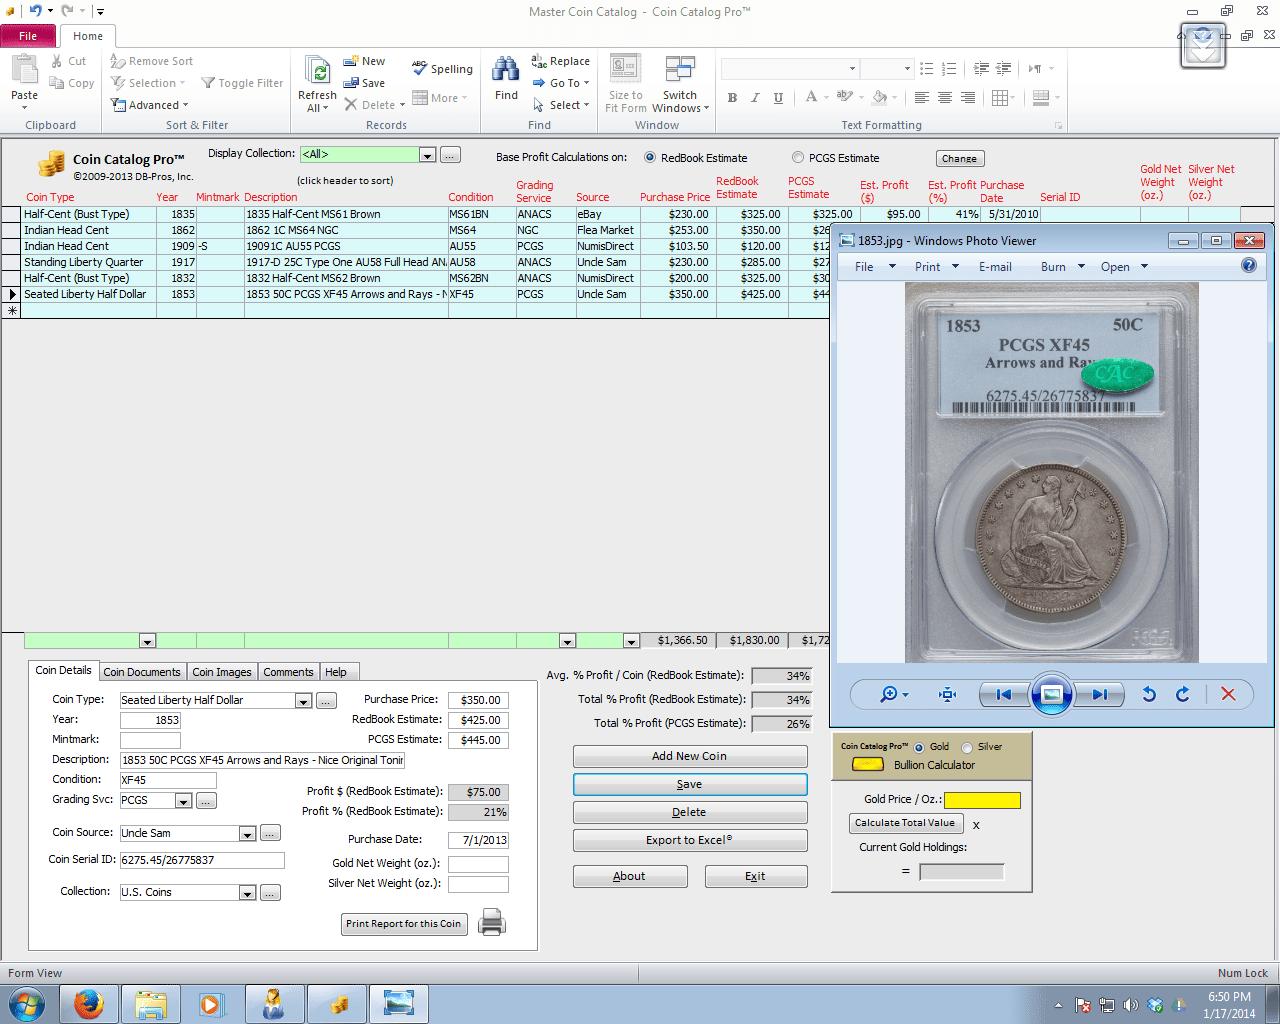 Coin Catalog Pro